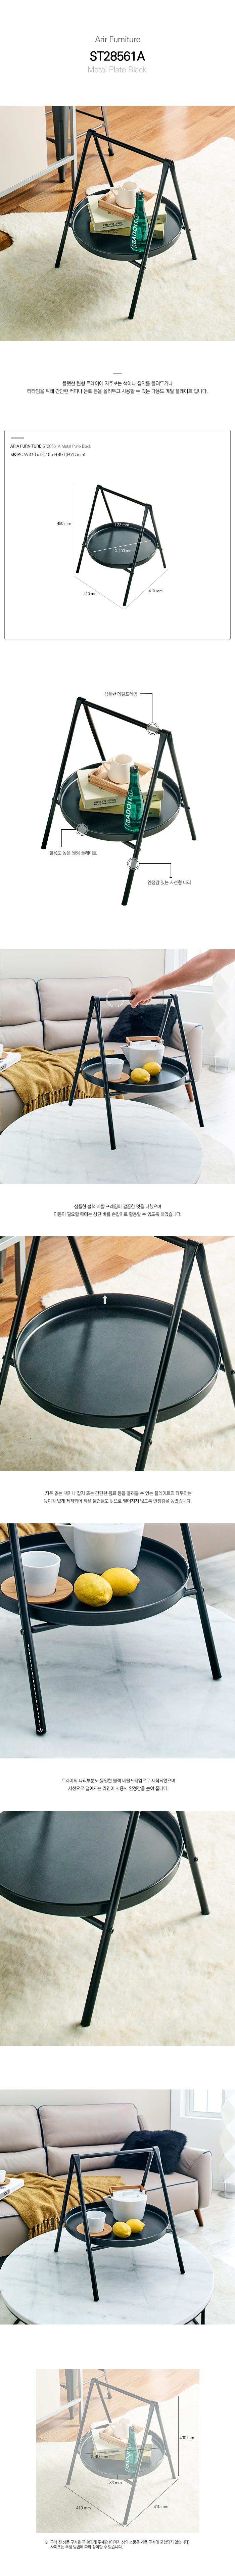 ST28561A-Metal-Plate-Black_180918.jpg